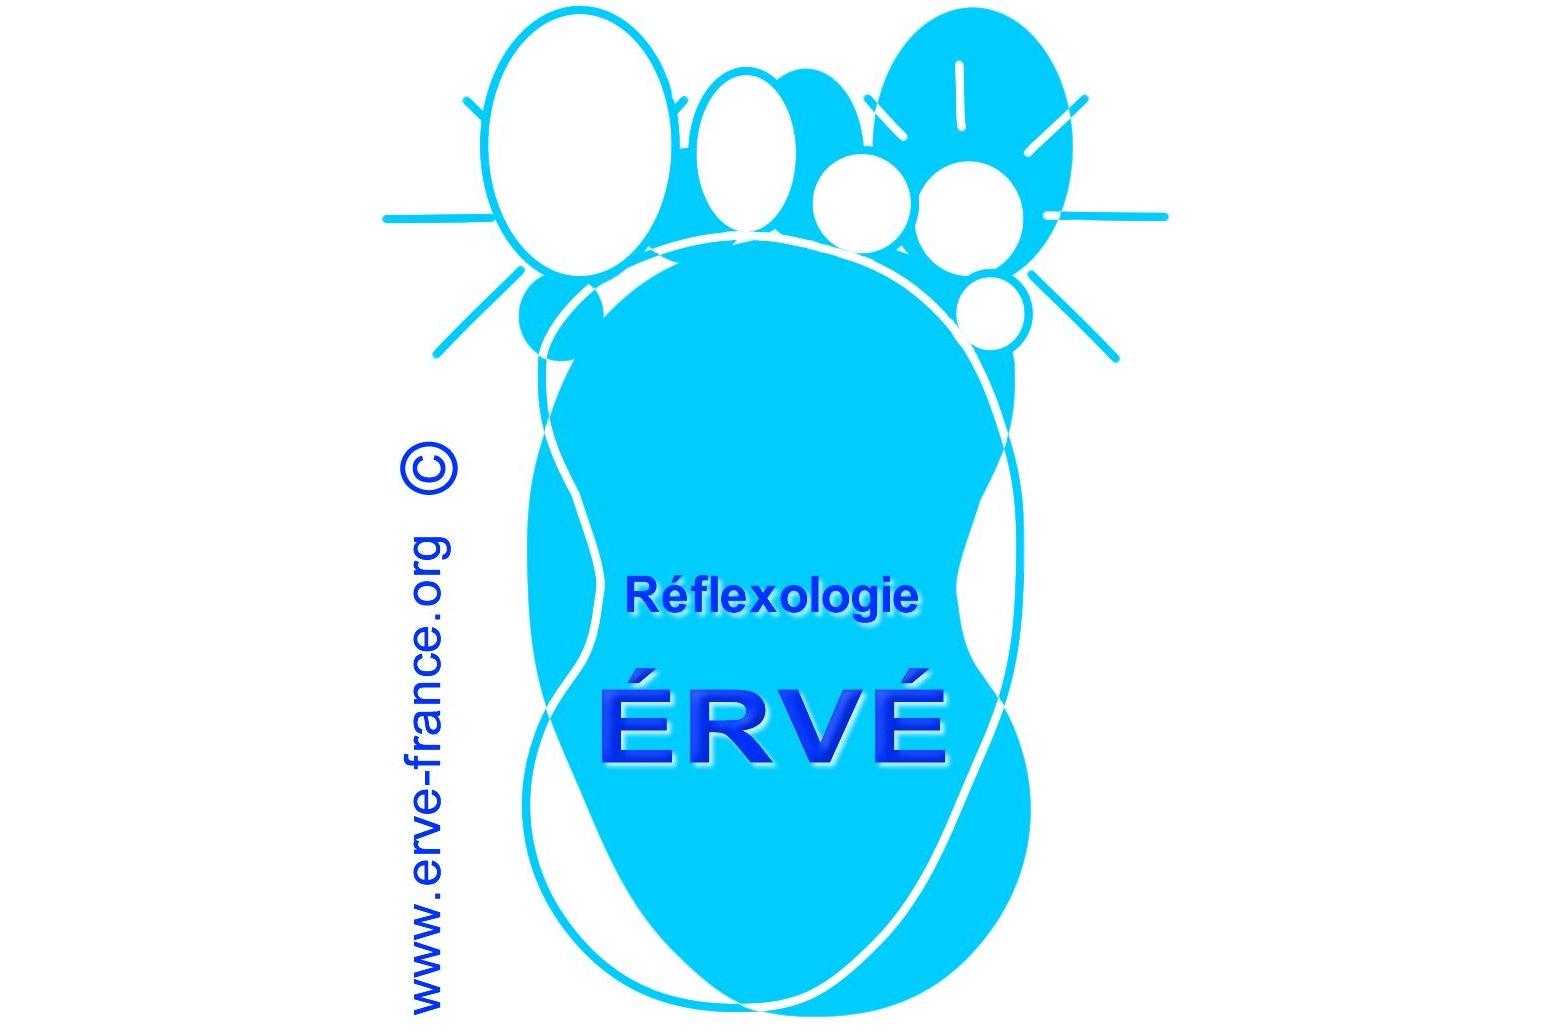 Formation réflexologie ÉRVÉ